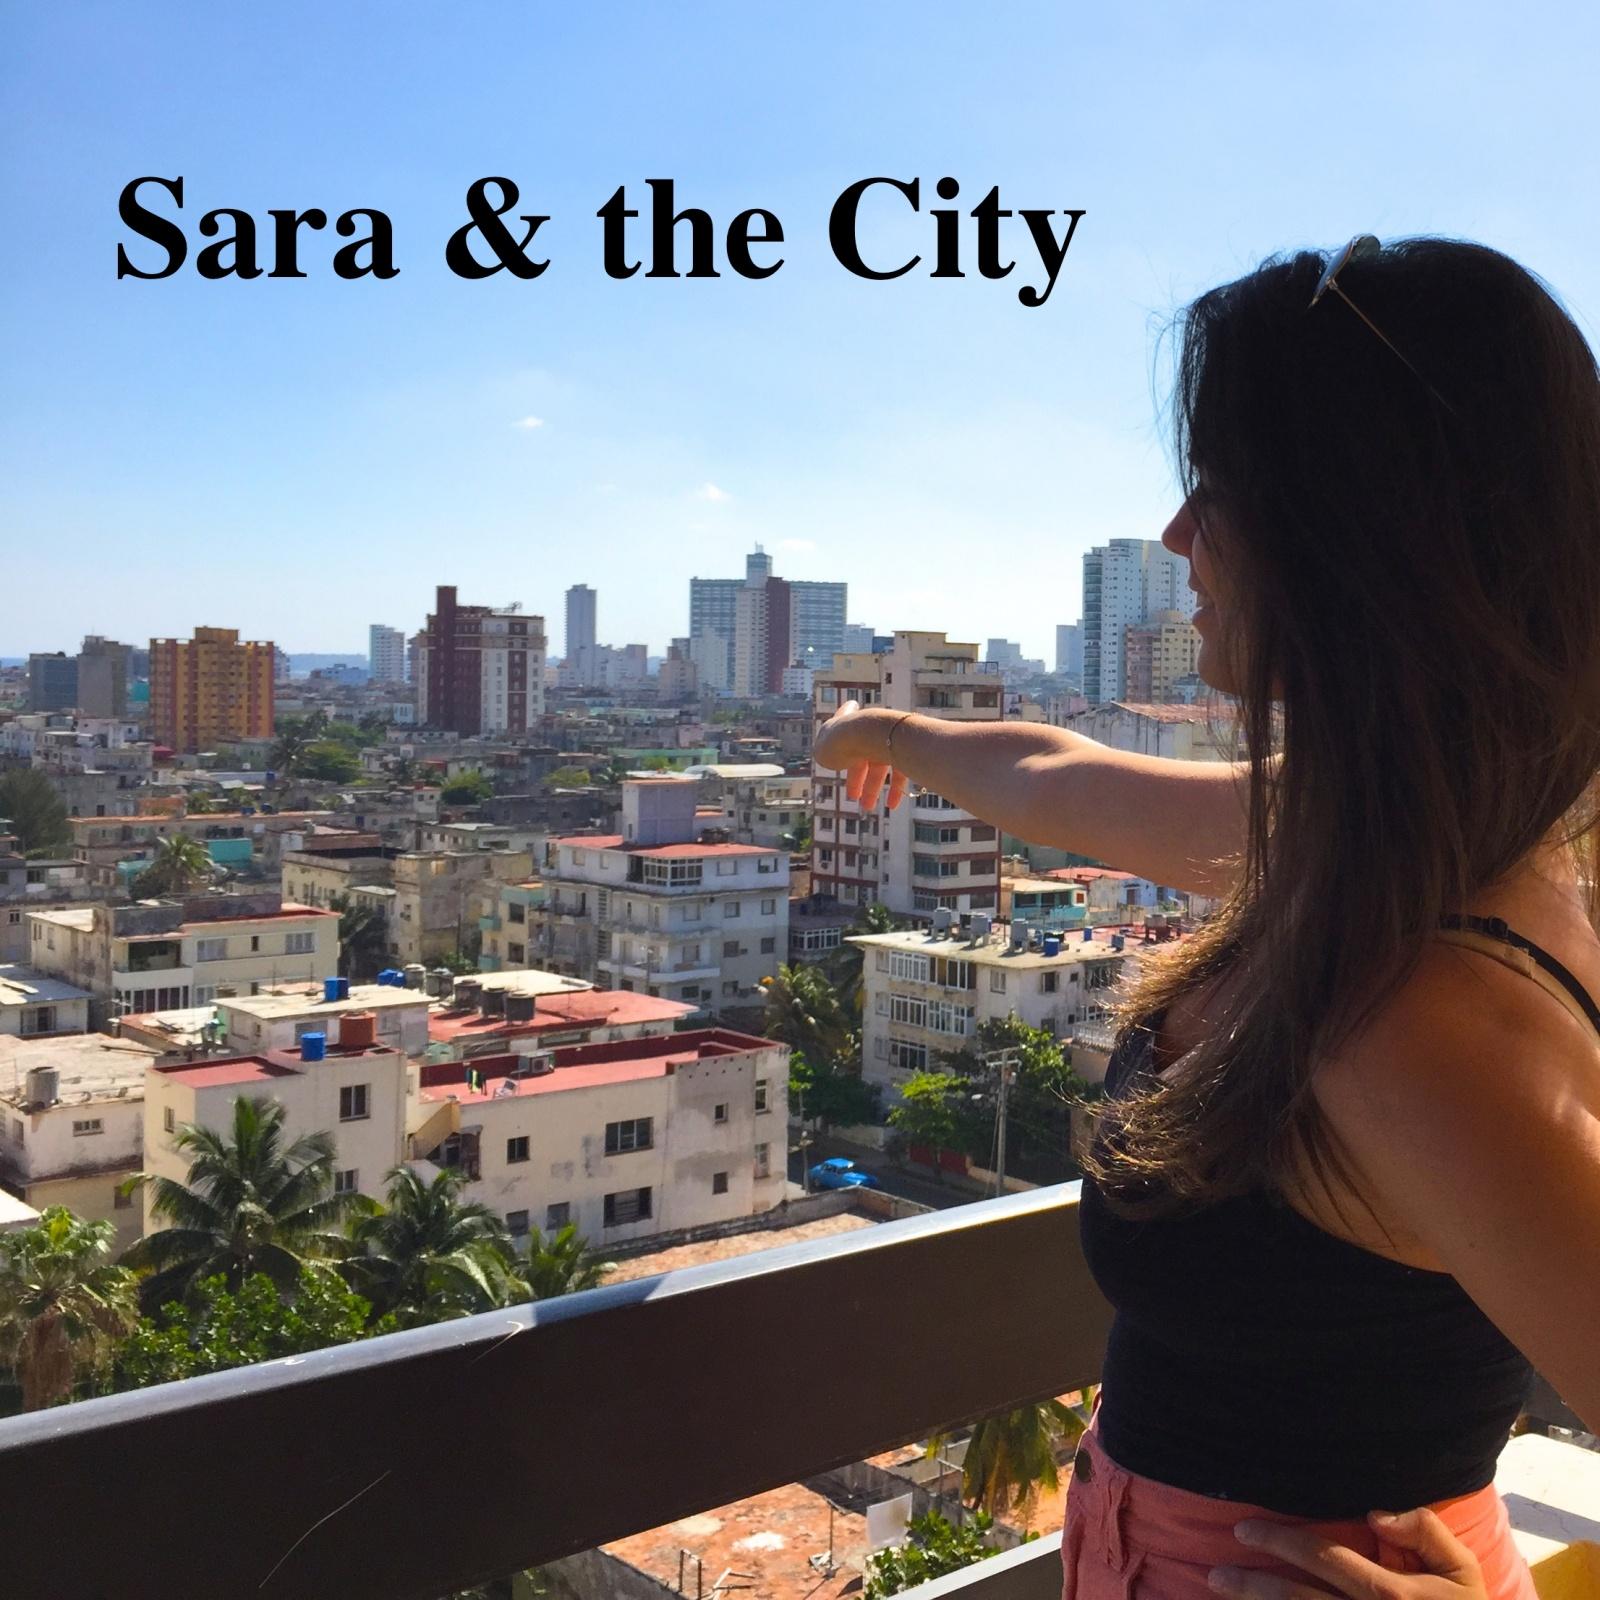 Sara & the city, amb Sara Canals